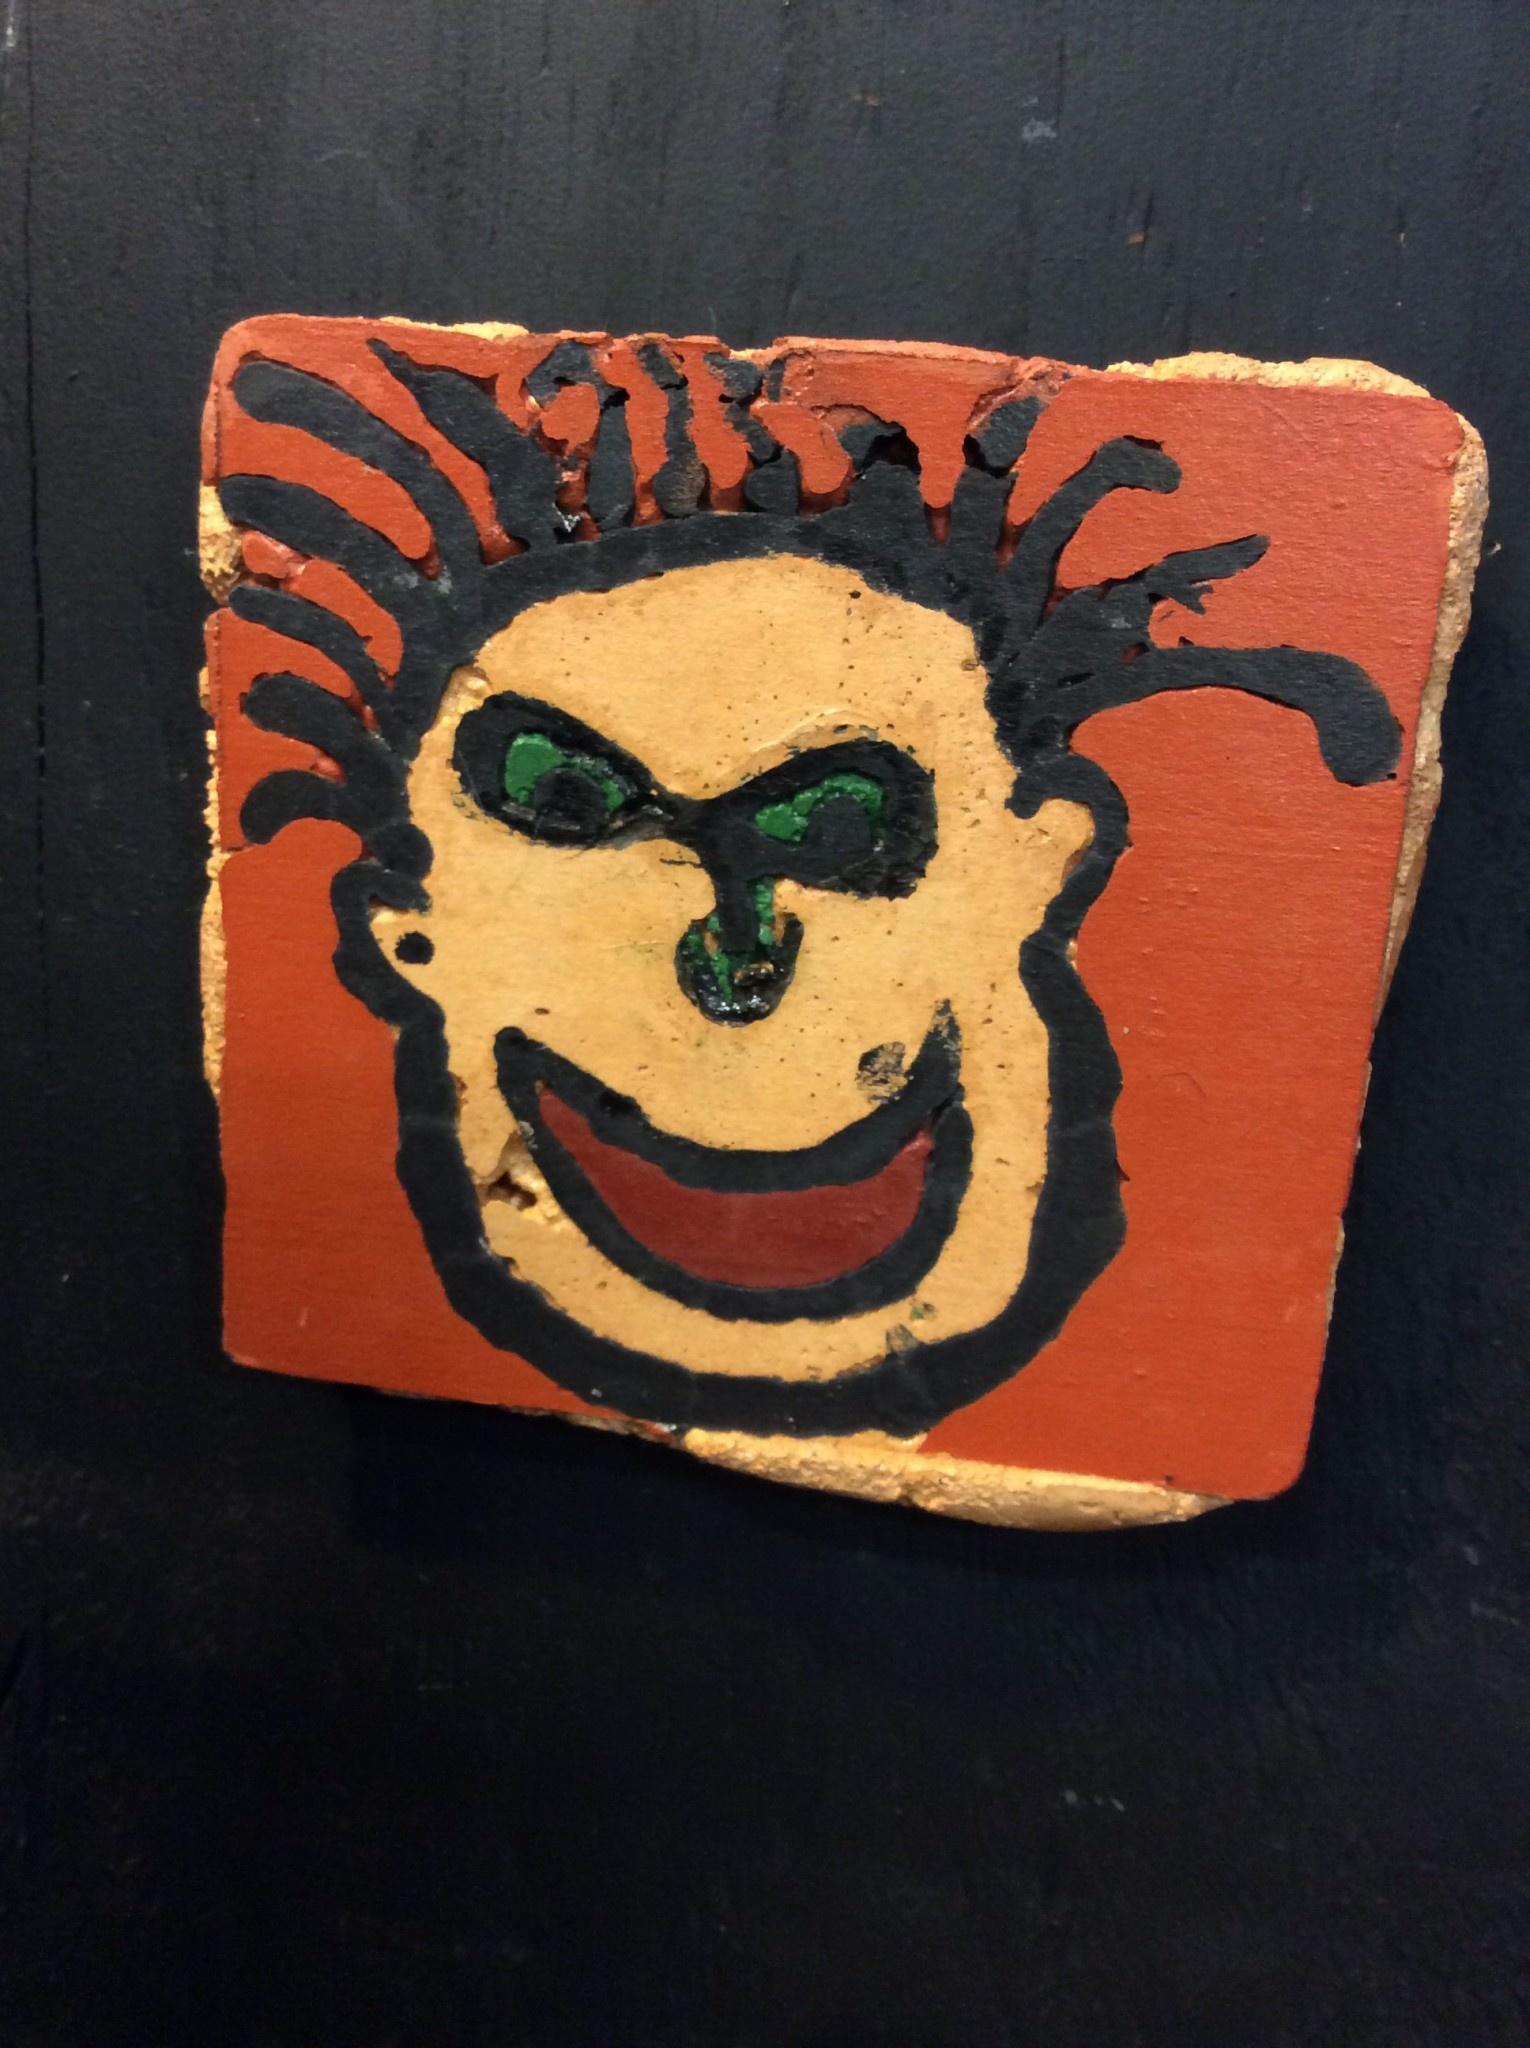 Cast stone crazy face plaque